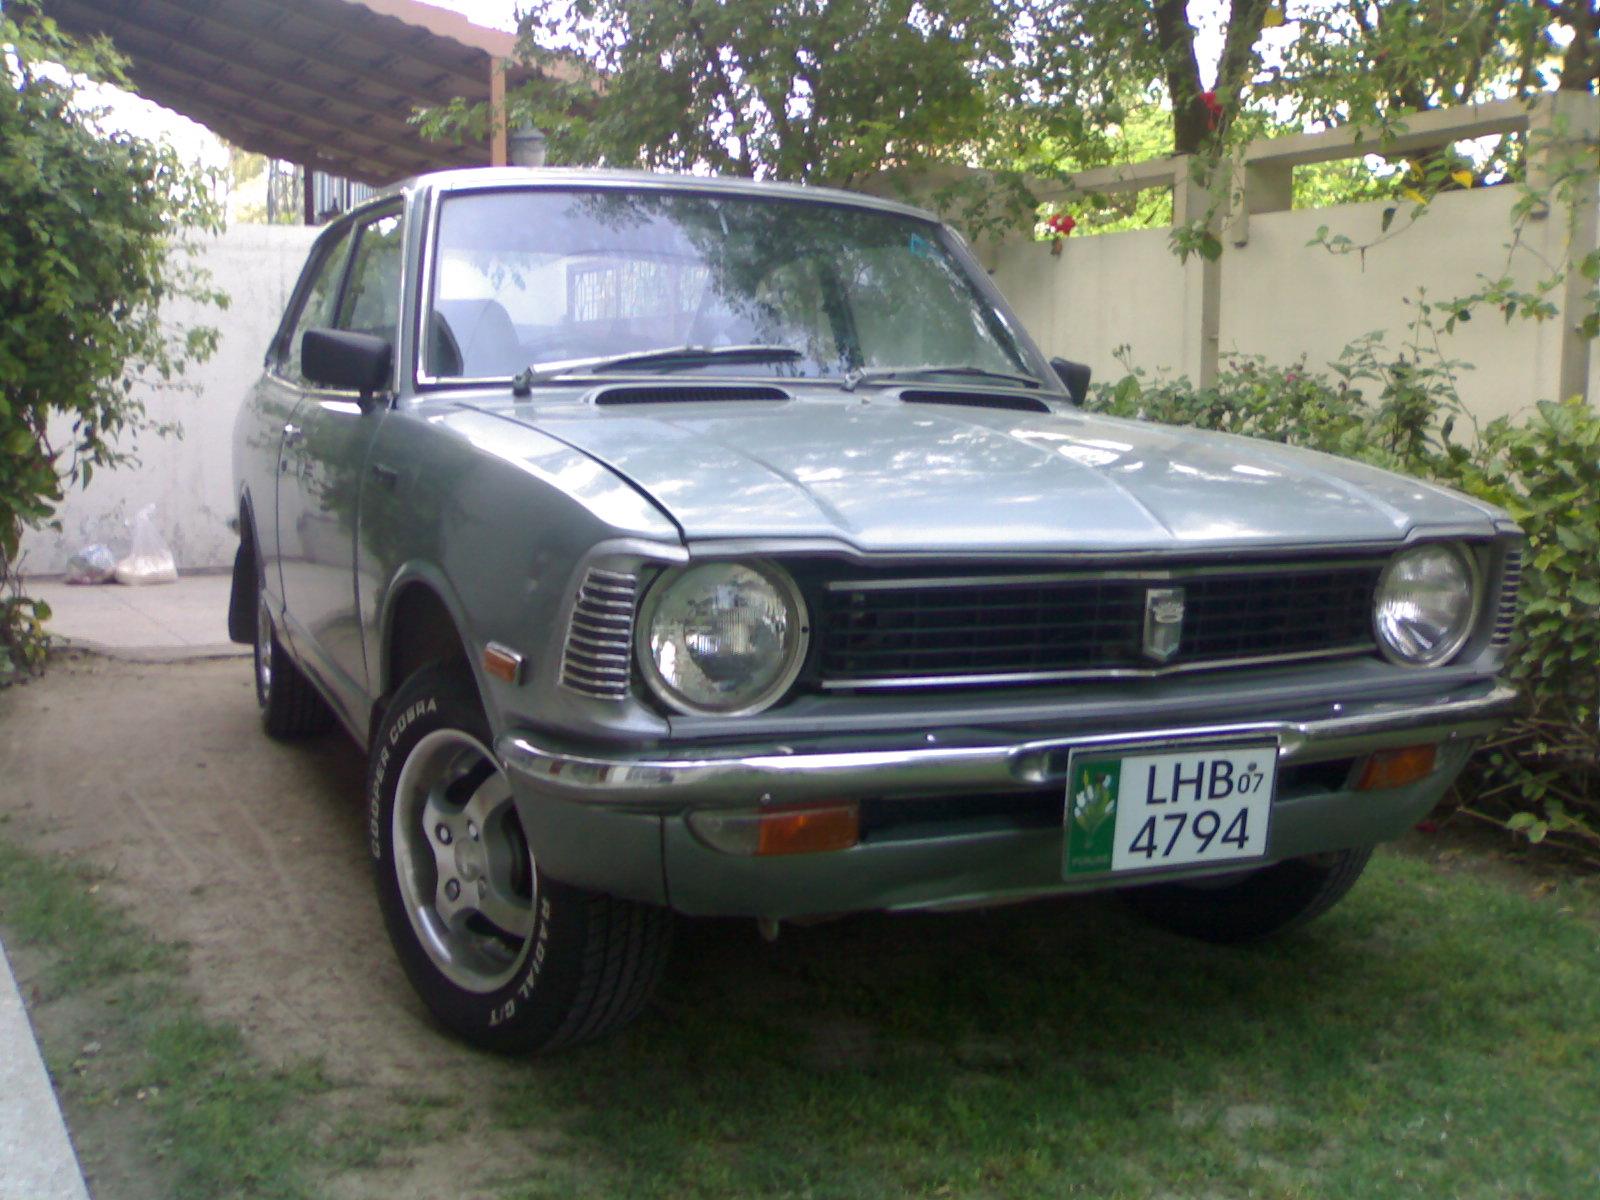 Toyota Corolla 1974 of shonas - Member Ride 15904 | PakWheels